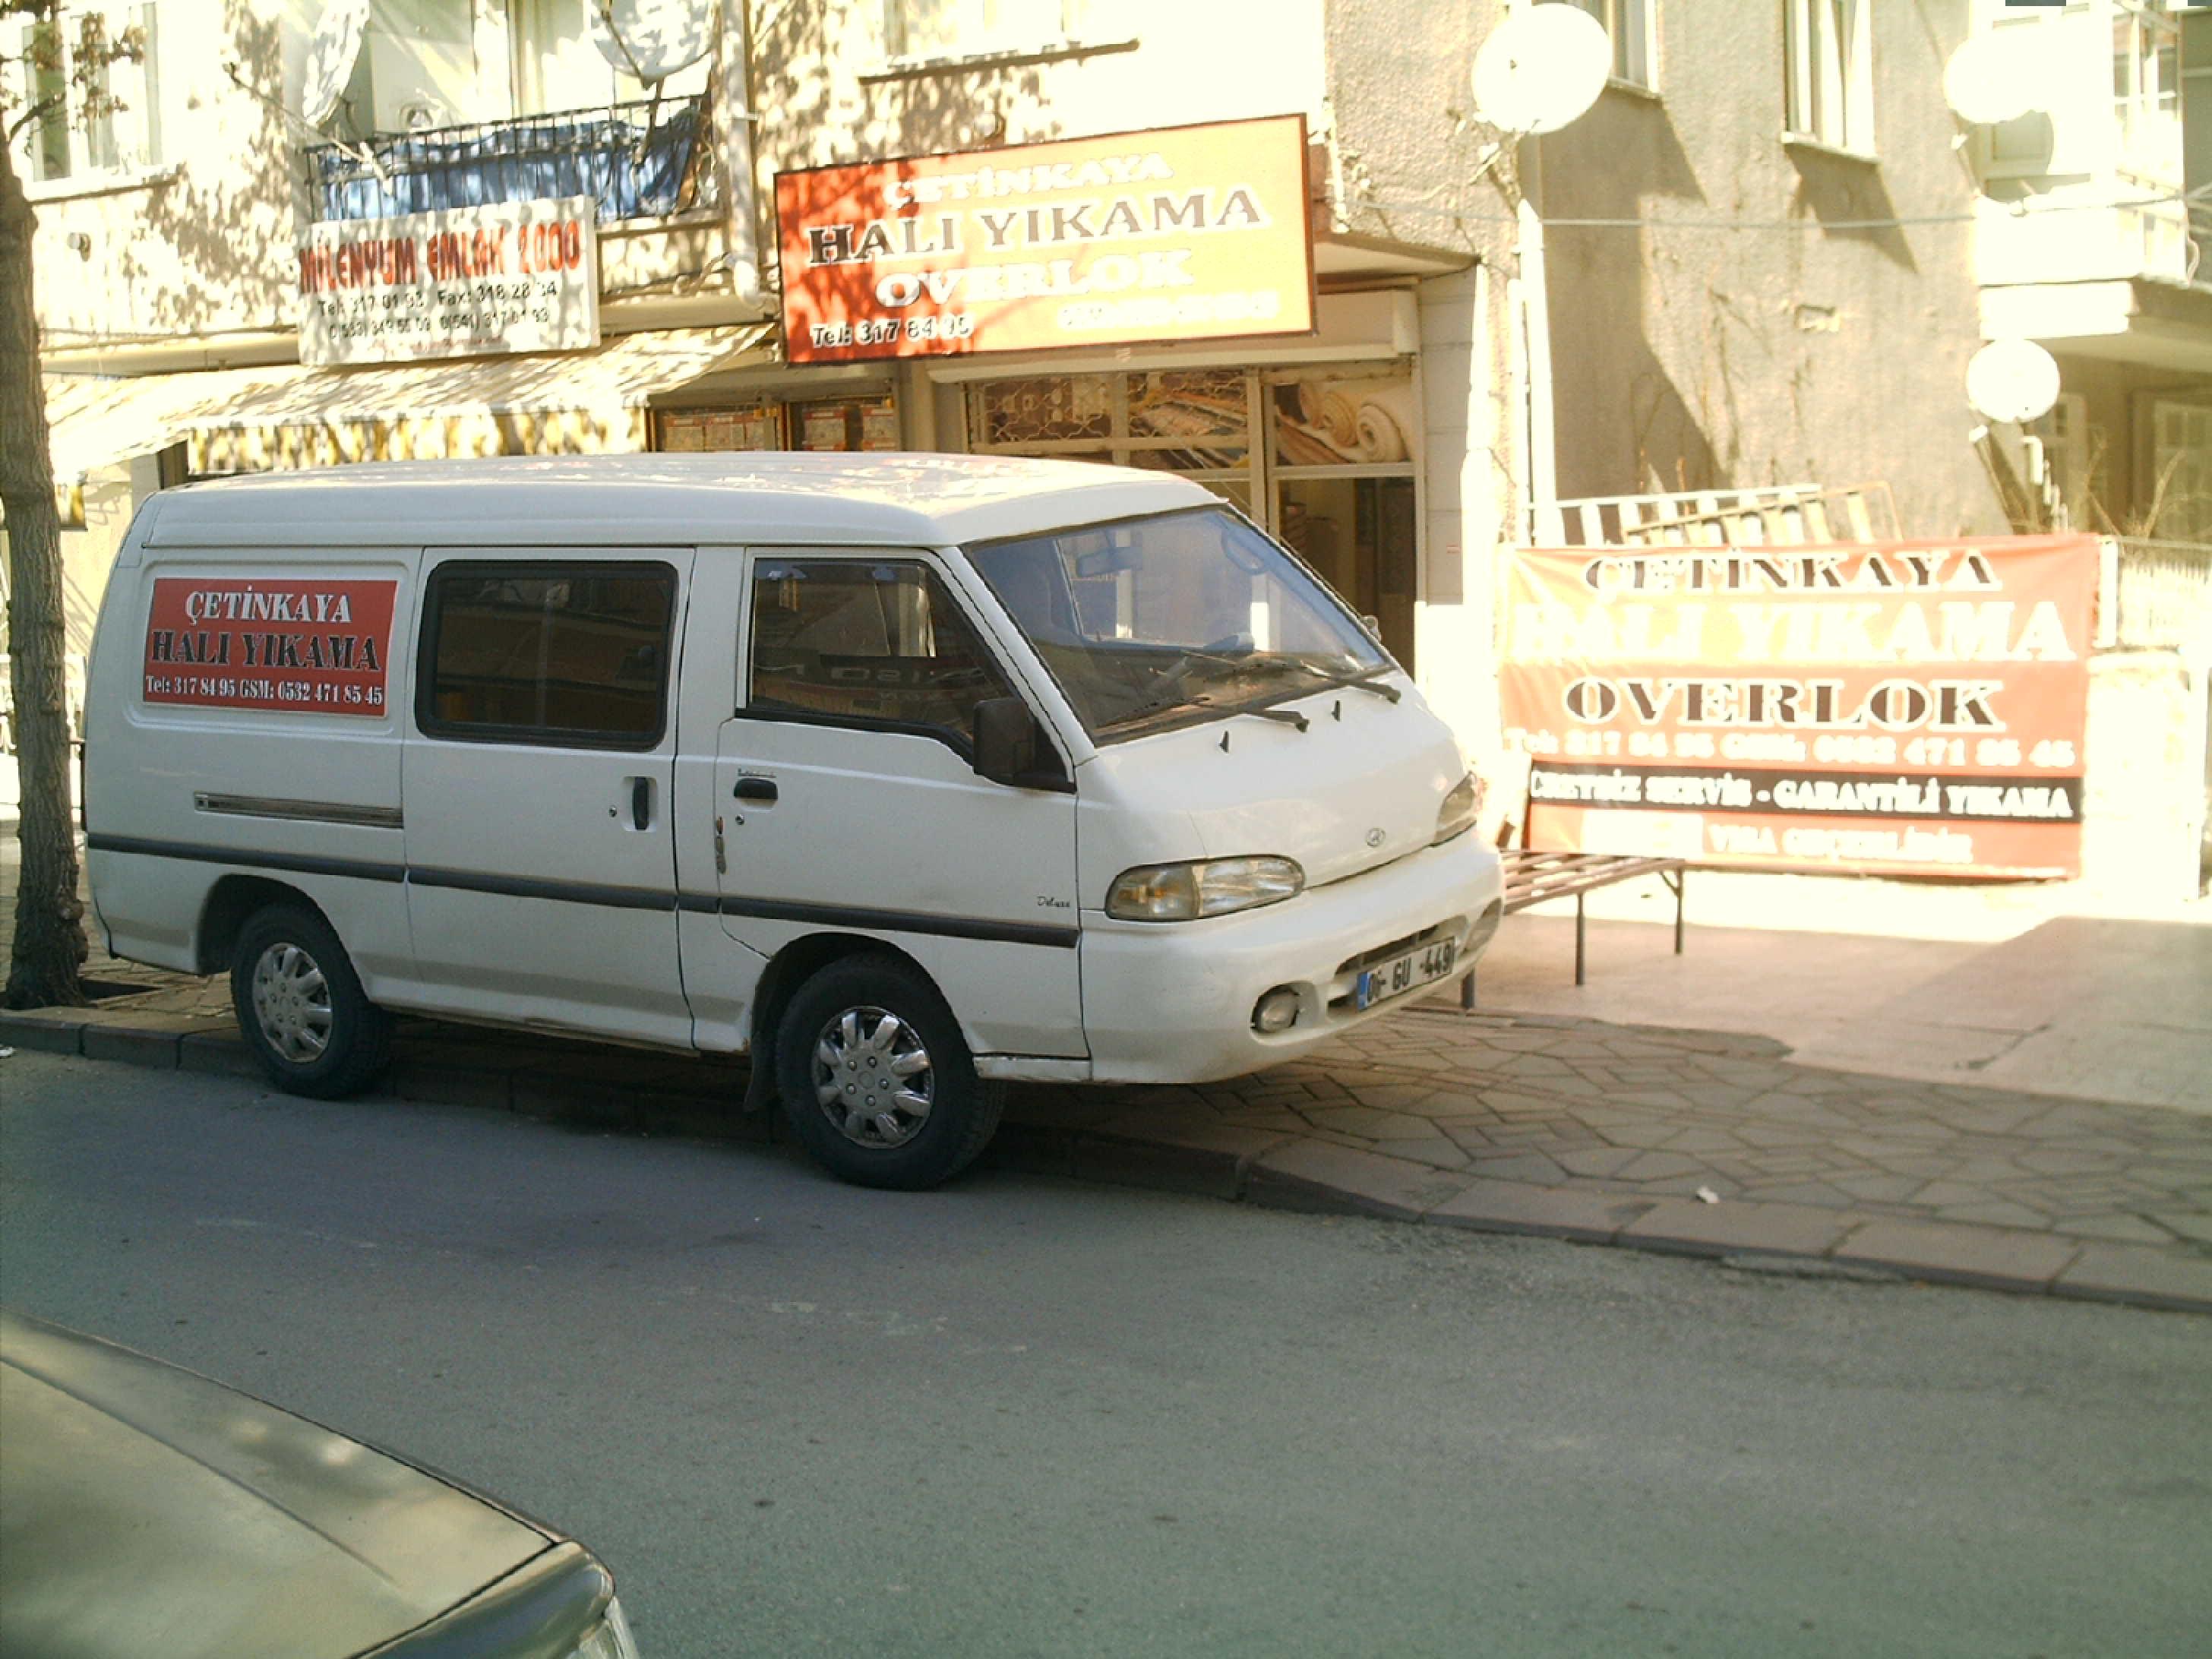 akdere_hali_yikama_servis